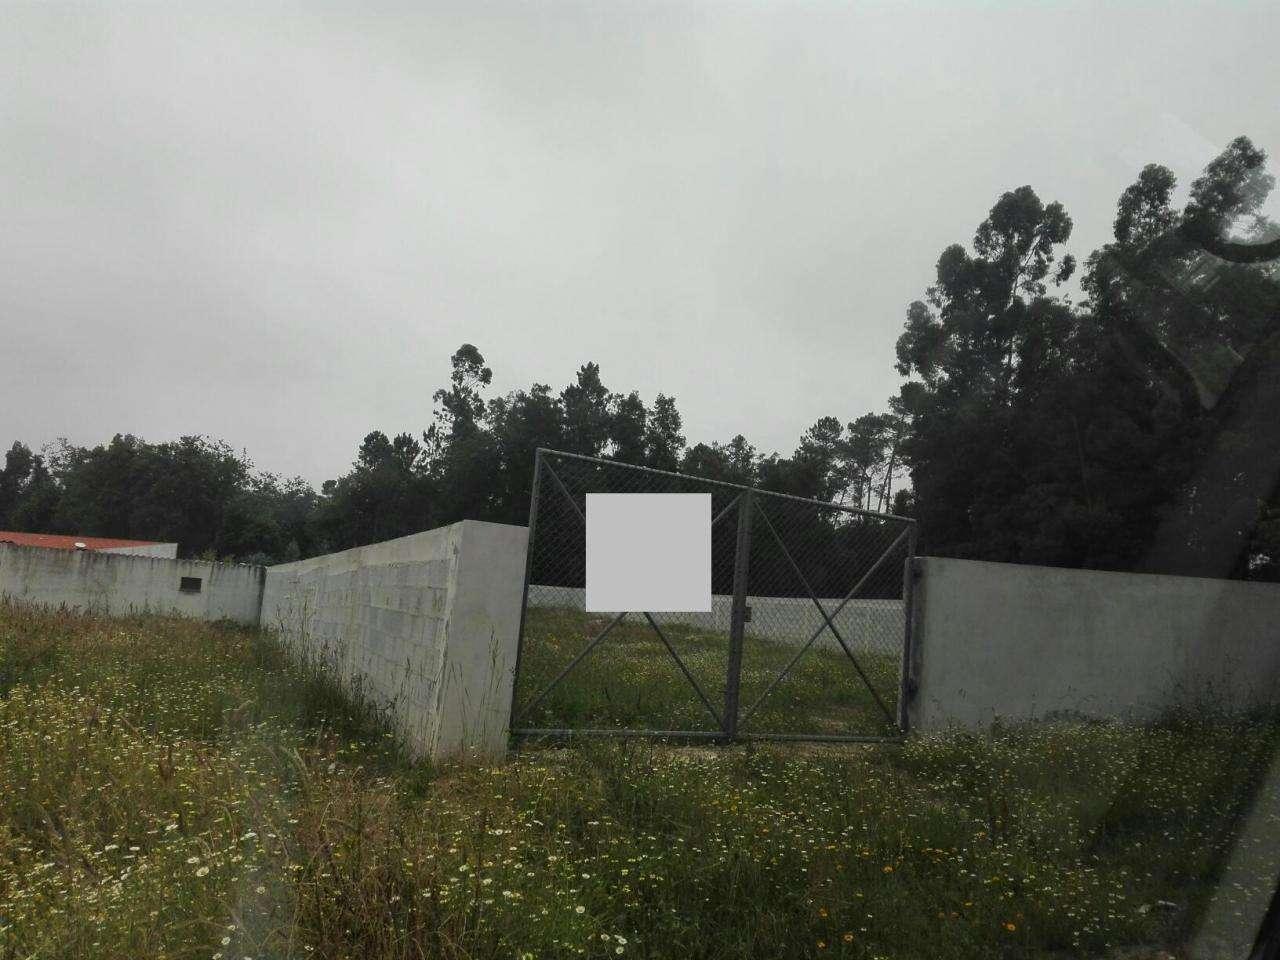 Terreno para comprar, Vila de Cucujães, Aveiro - Foto 1